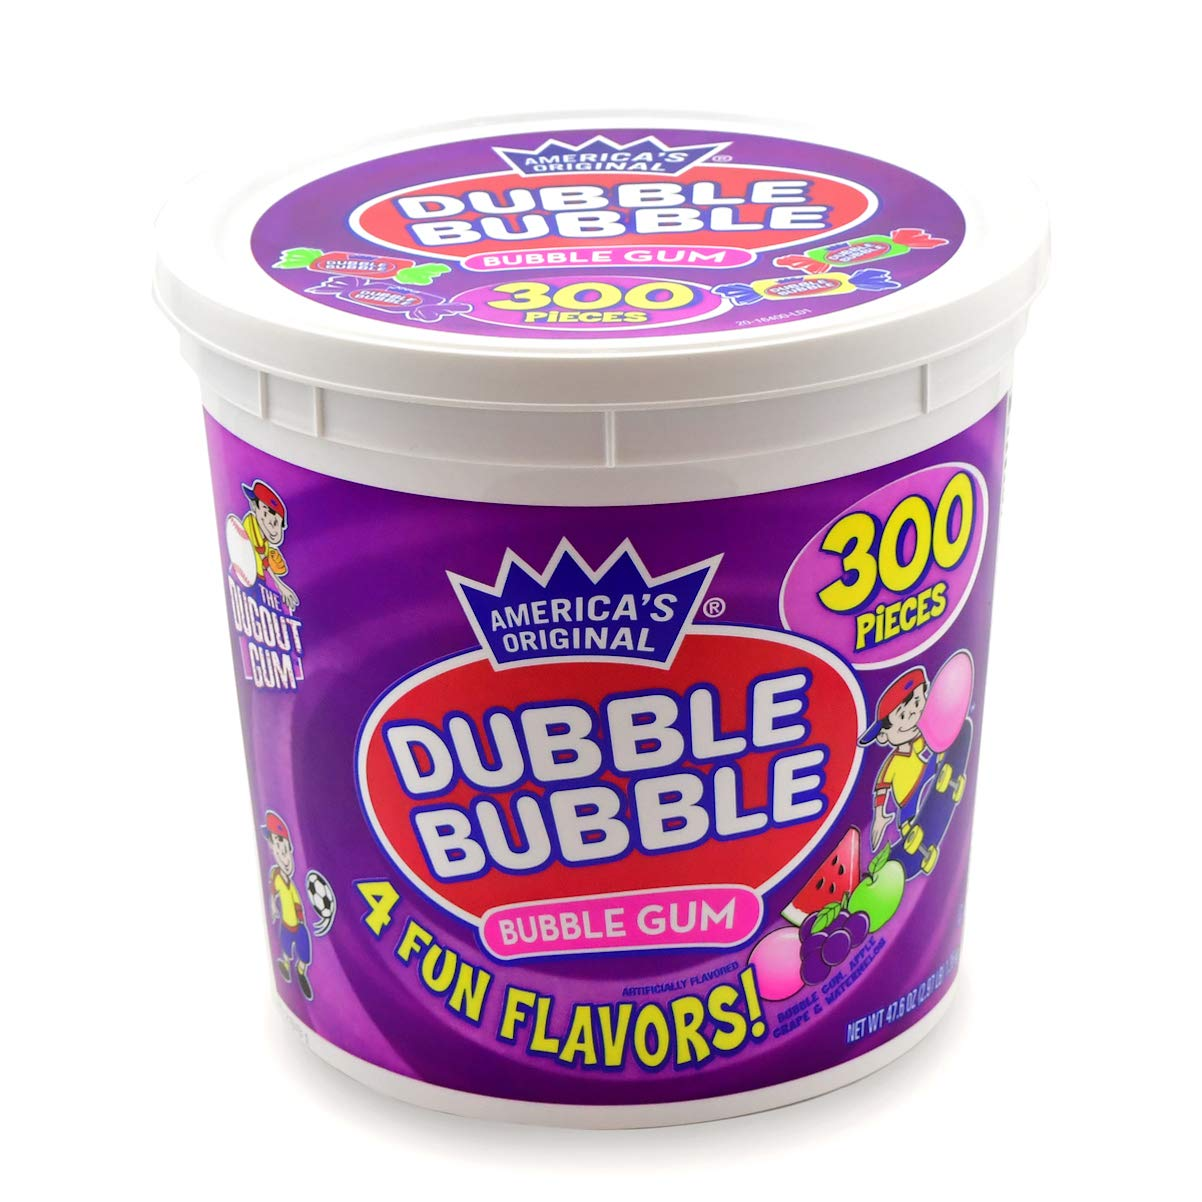 Tootsie Roll Dubble Bubble, No Peanut Allergen Tub, Assorted, 300 Count.